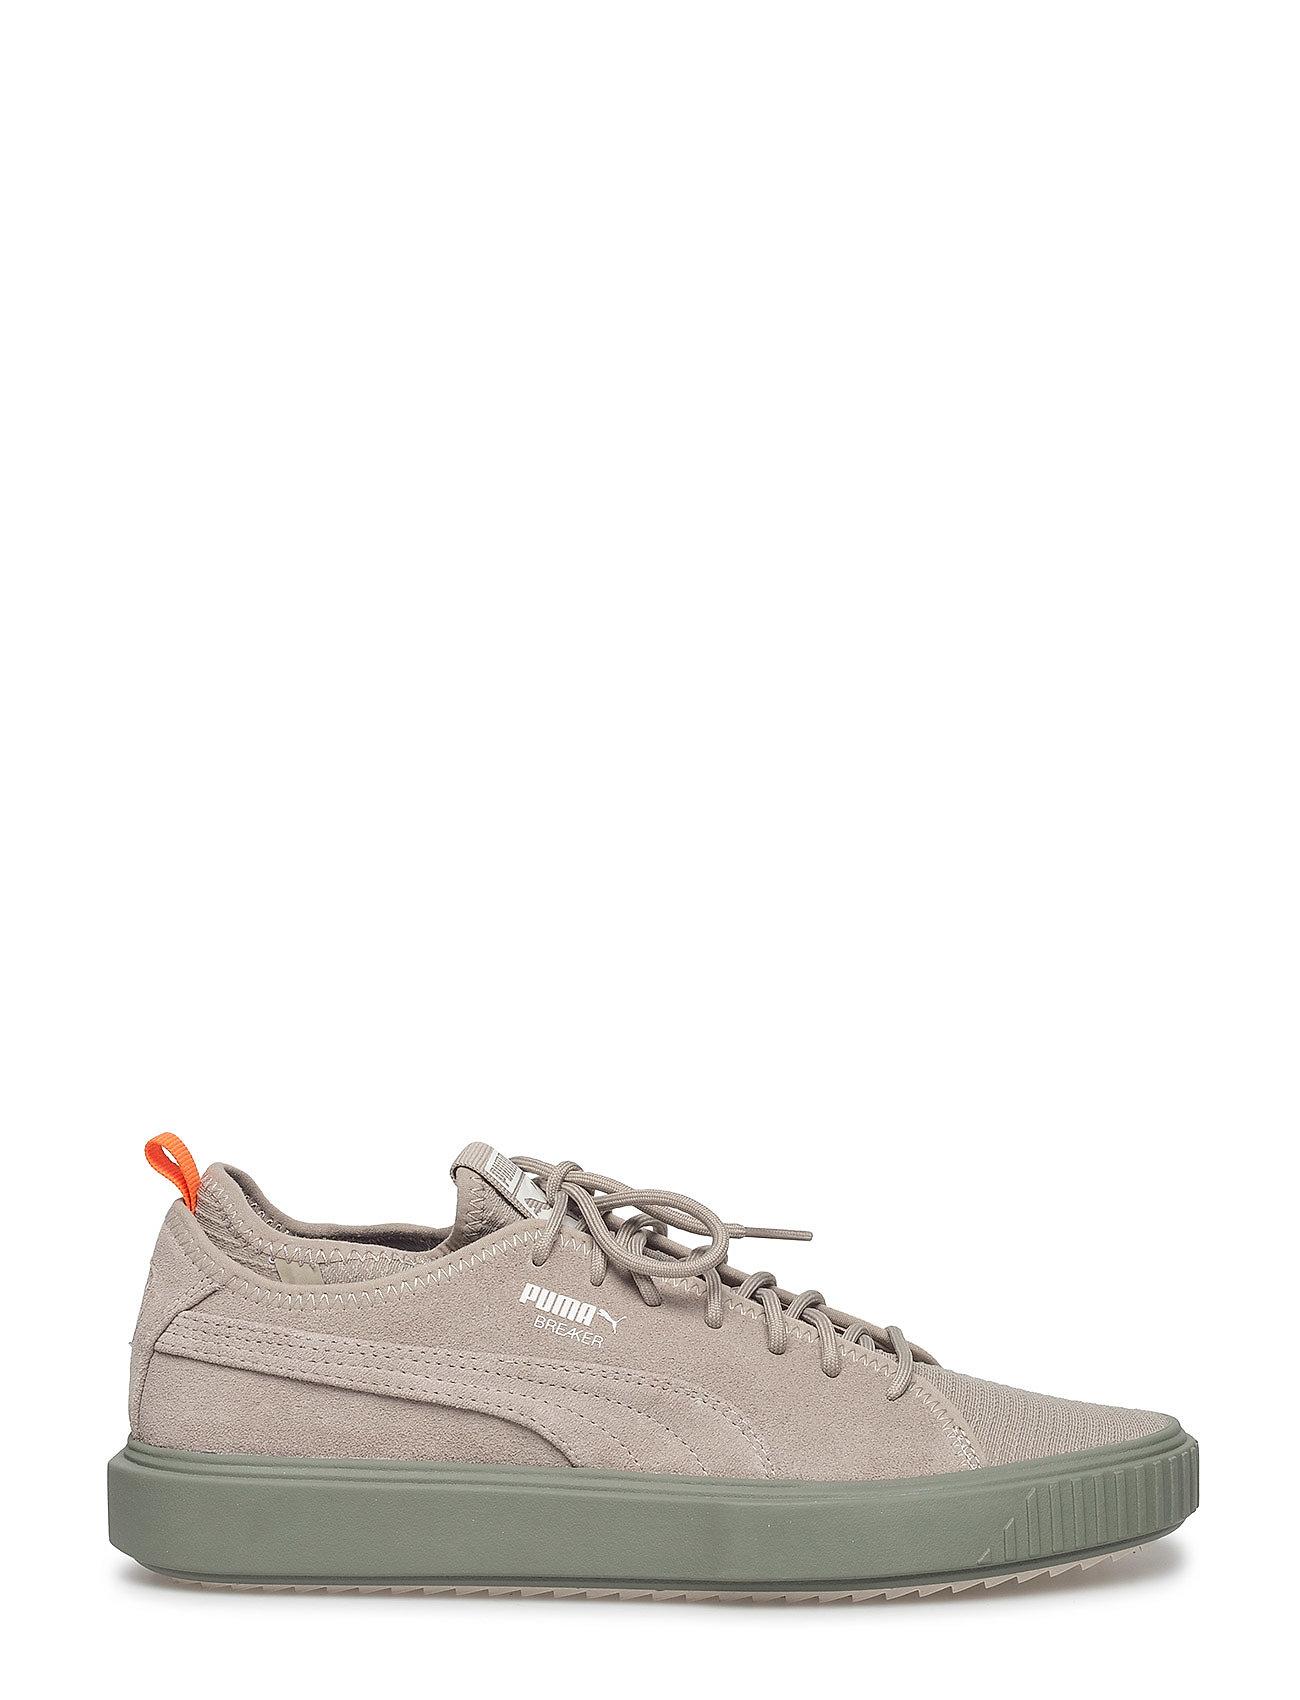 Puma Breaker Mesh Fof Low top Sneakers Grå PUMA